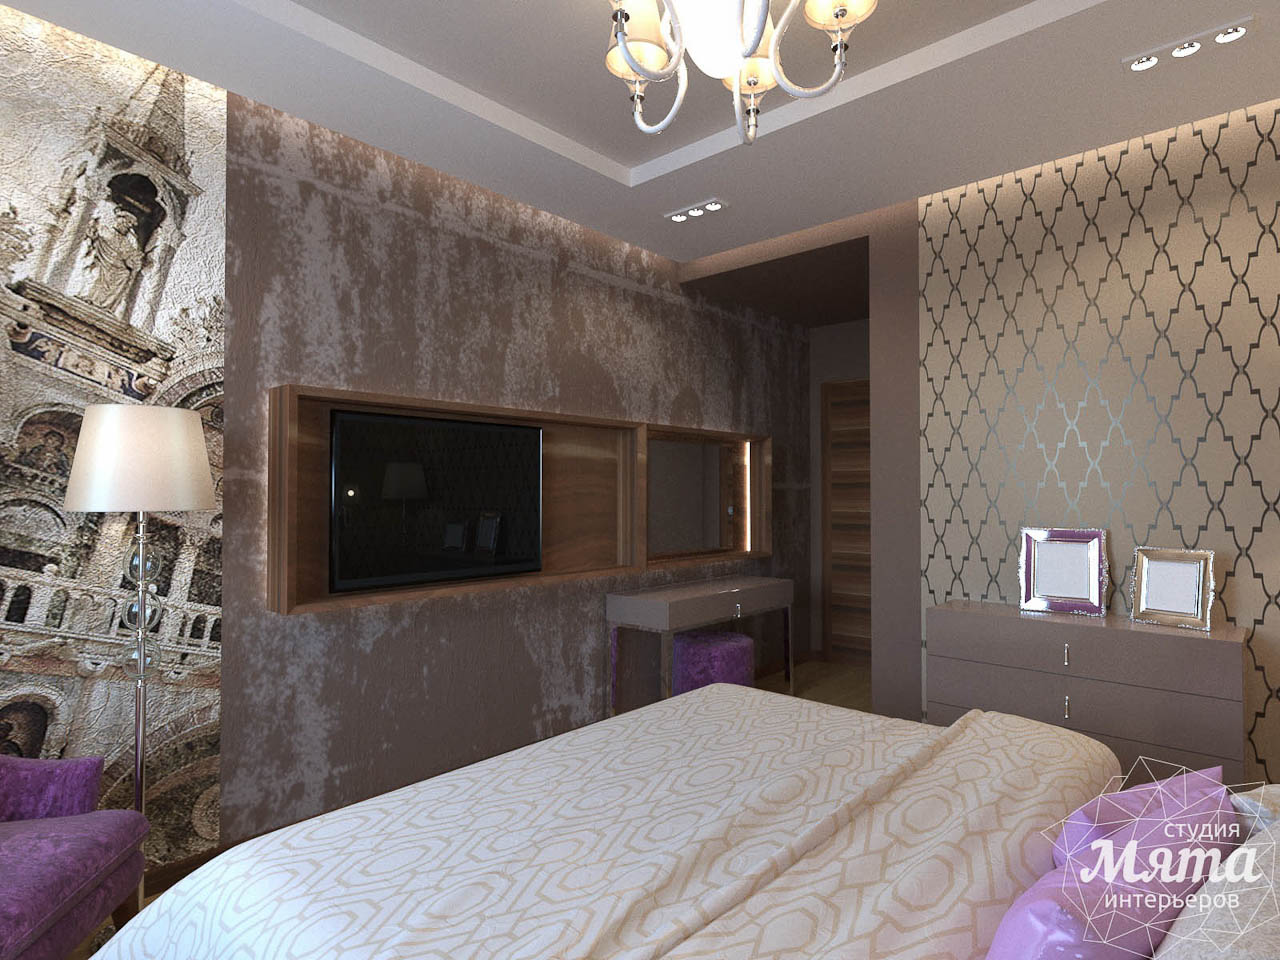 Дизайн интерьера трехкомнатной квартиры по ул. Мельникова 27 img438337576